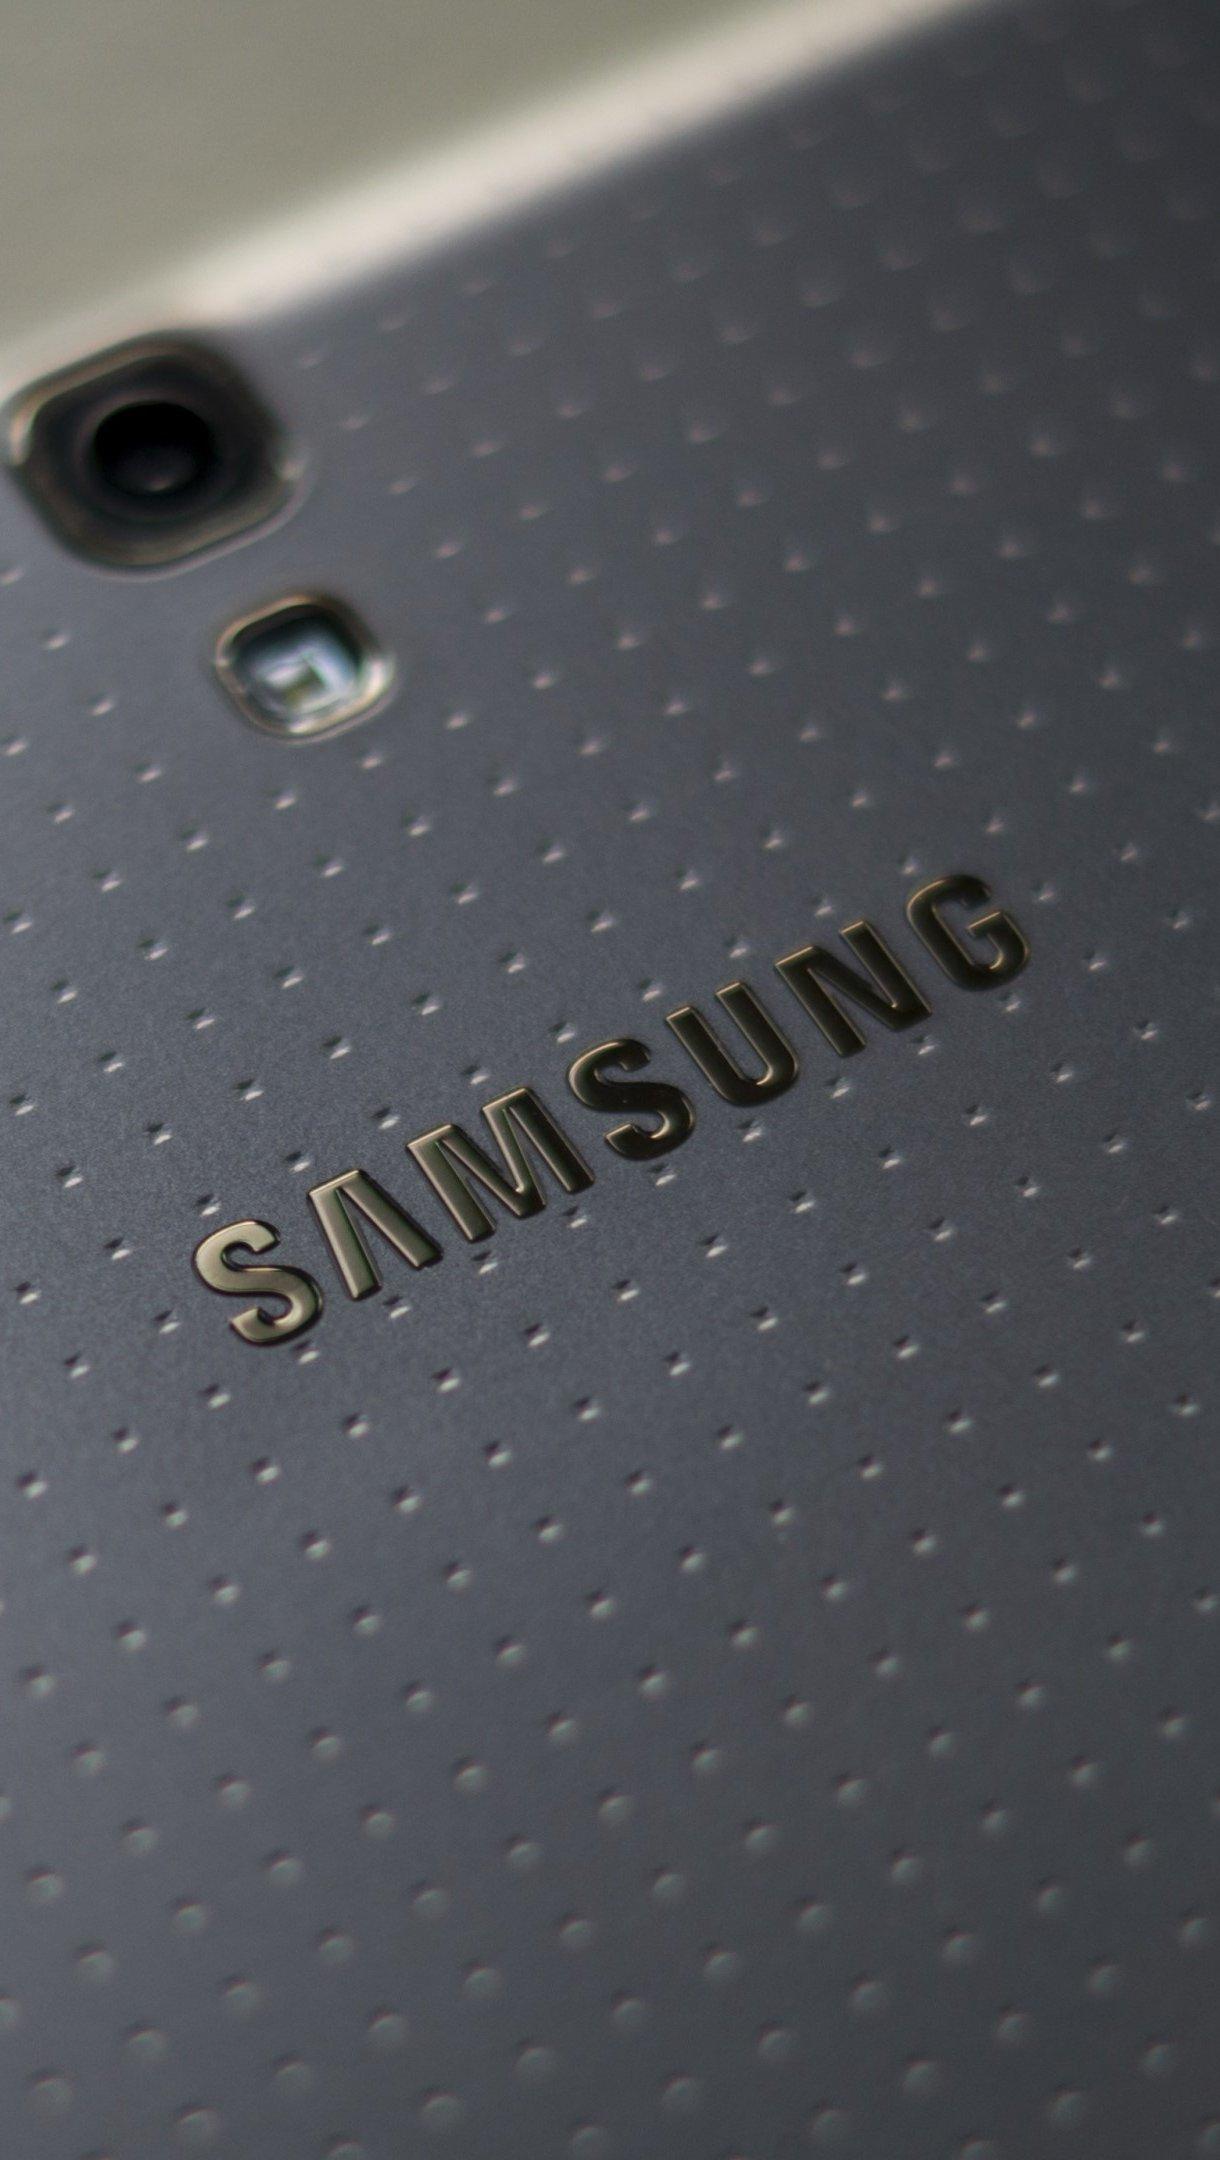 Wallpaper Samsung Galaxy logo Vertical